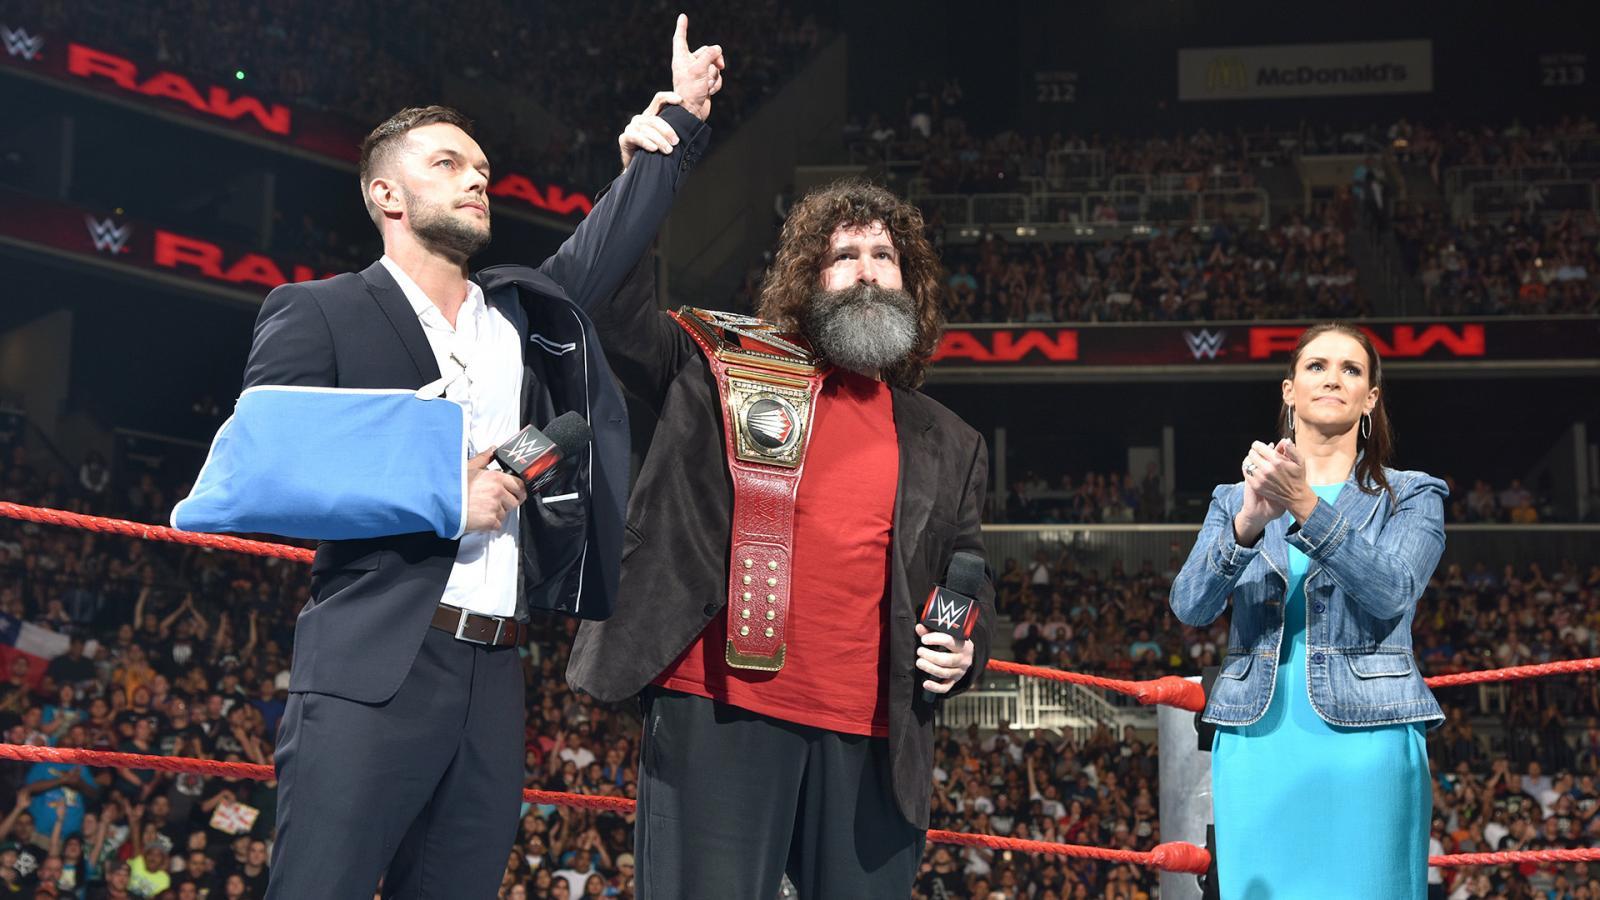 WWE RAW रिजल्ट 22 अगस्त, 2016 9